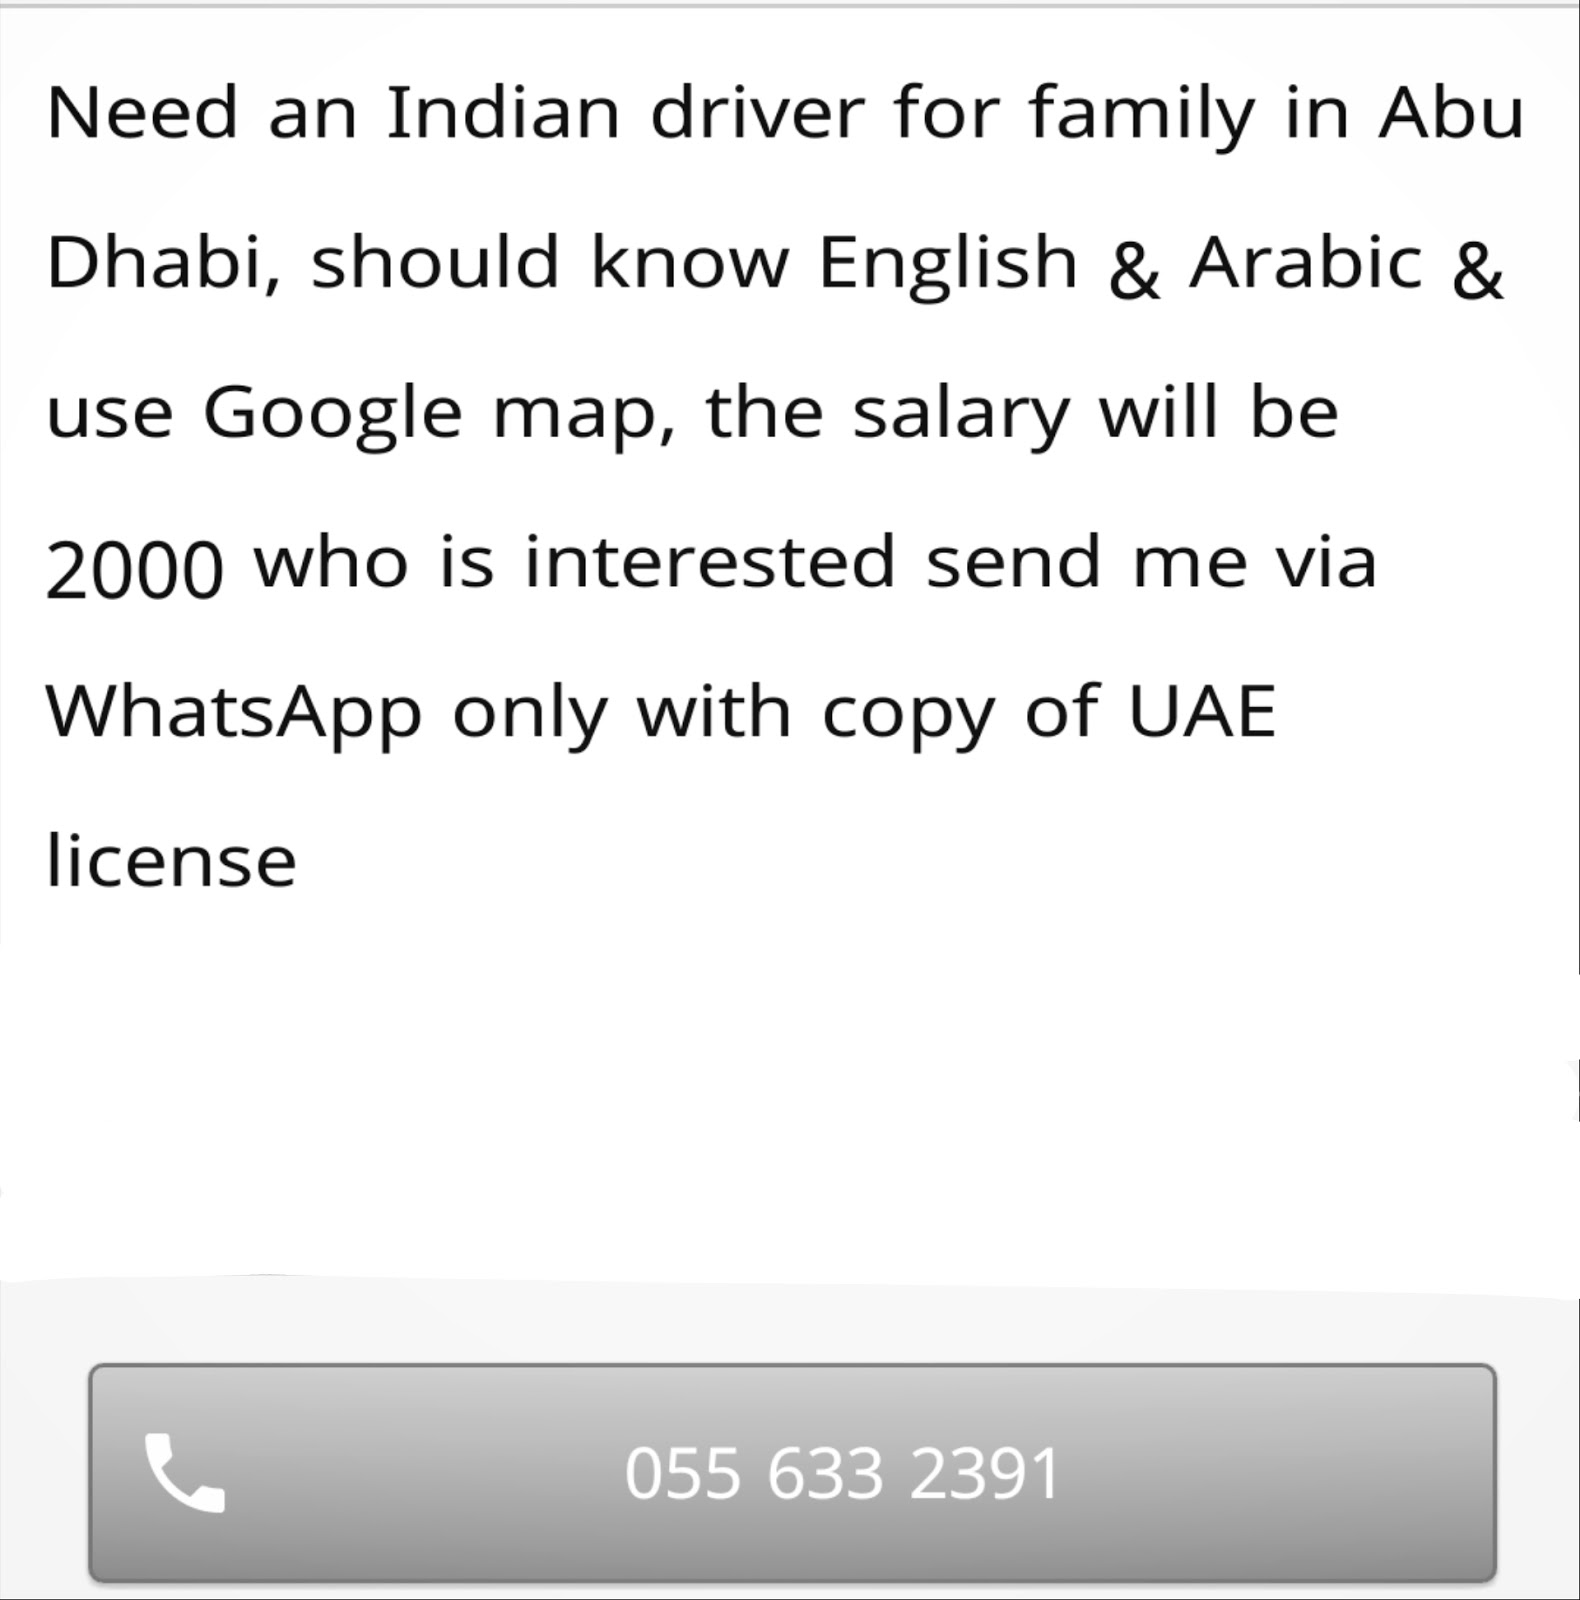 Driver Jobs in Dubai on google engineer, google hotels, google airlines, google media, google marketing, google id,